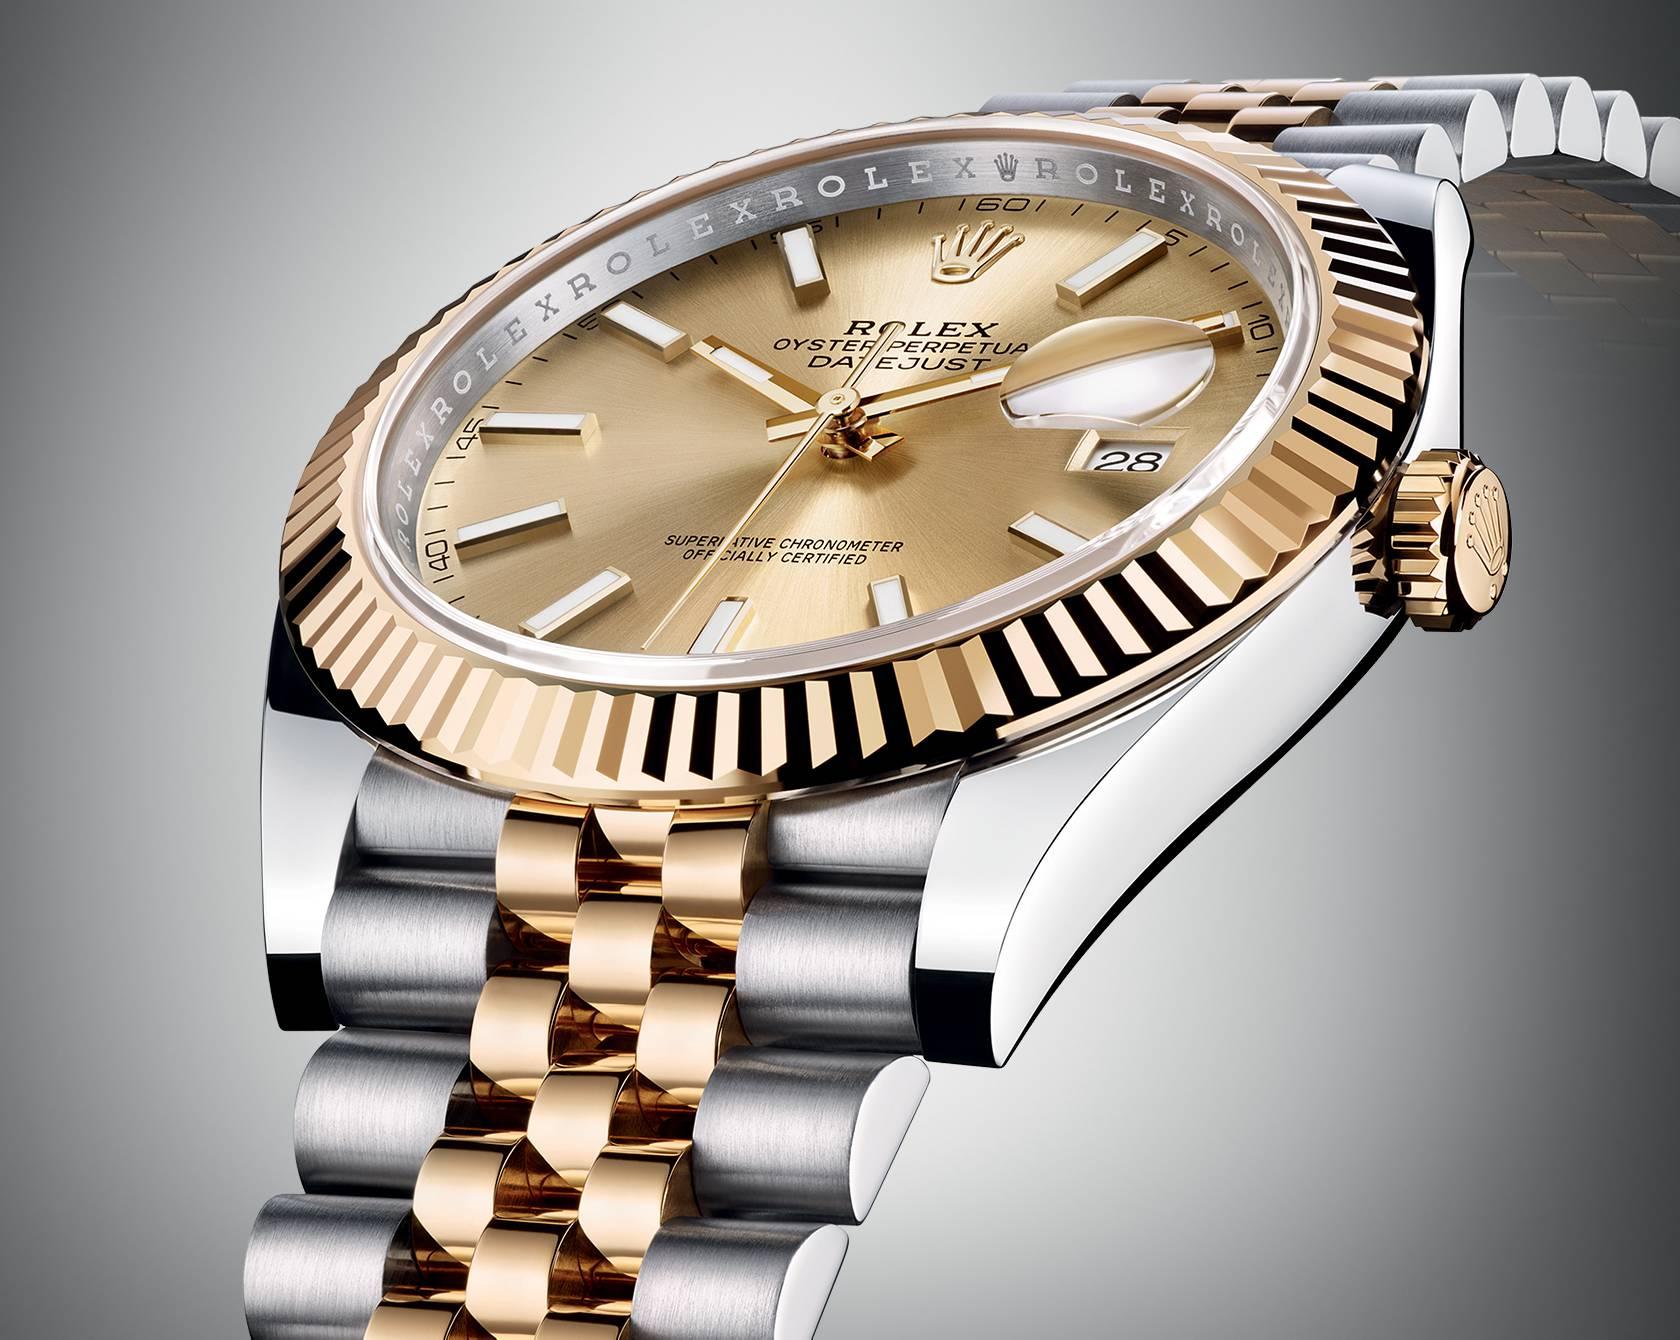 new-rolex-datejust-41-classic-watch.jpg